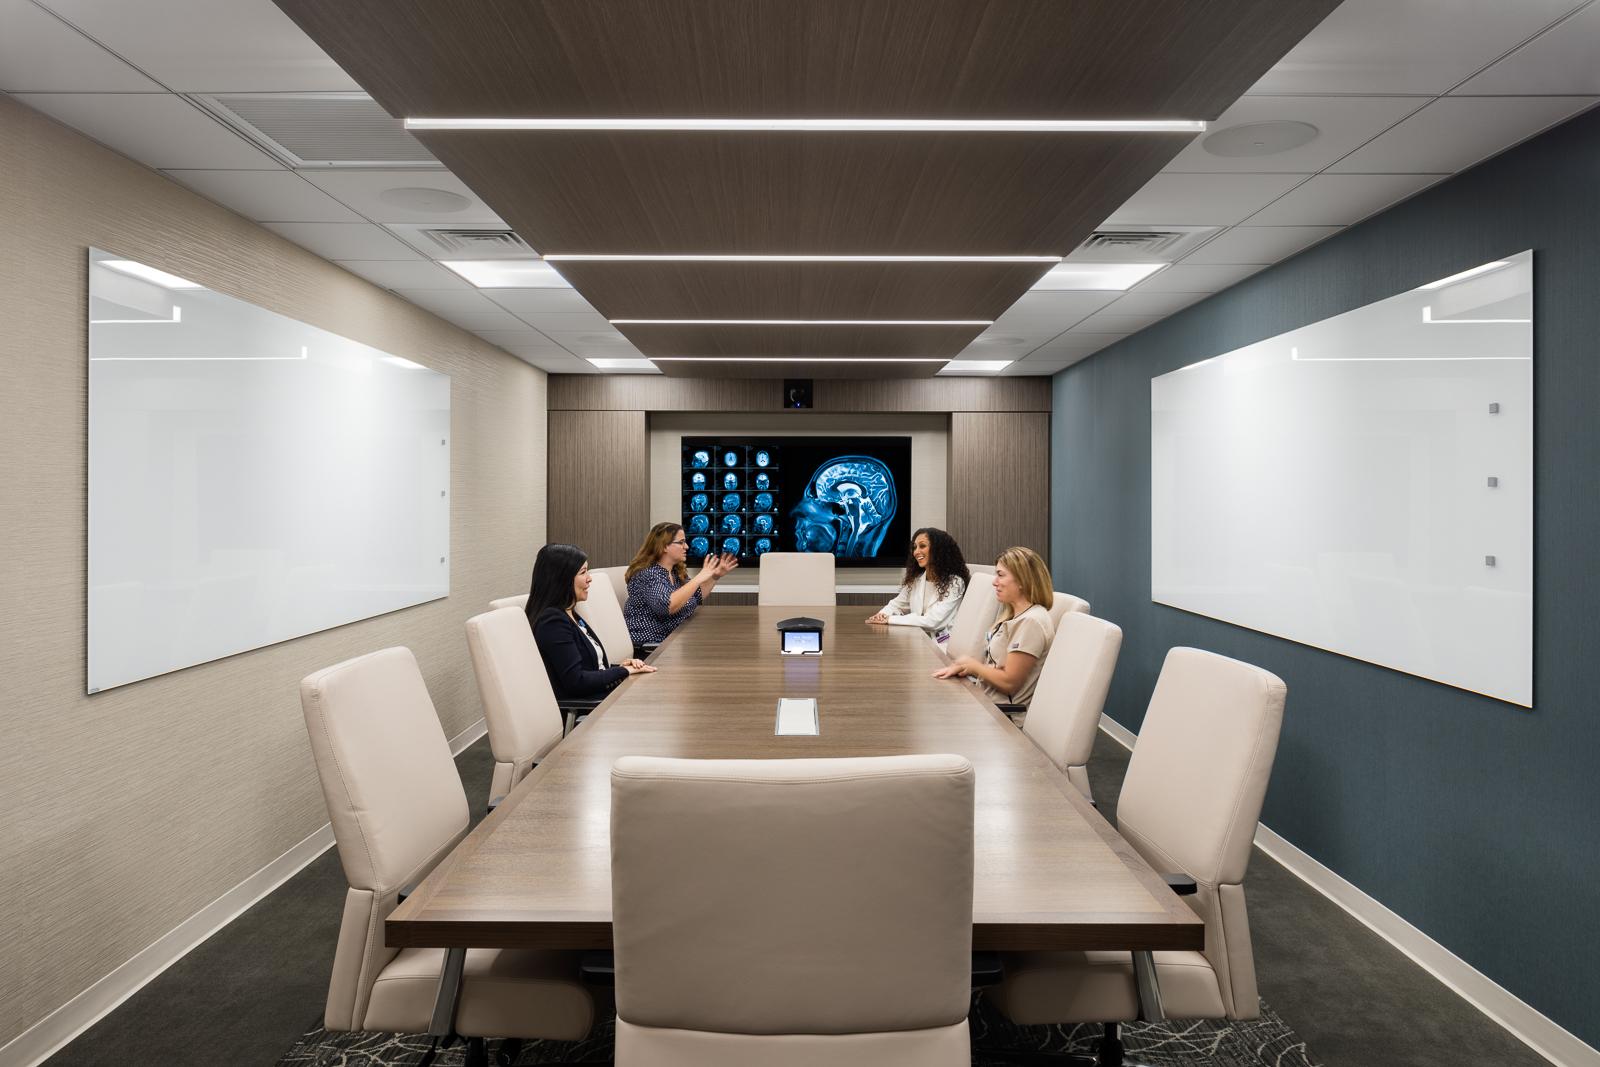 UCLA Health - Palos Verdes Imaging and Intervention Center